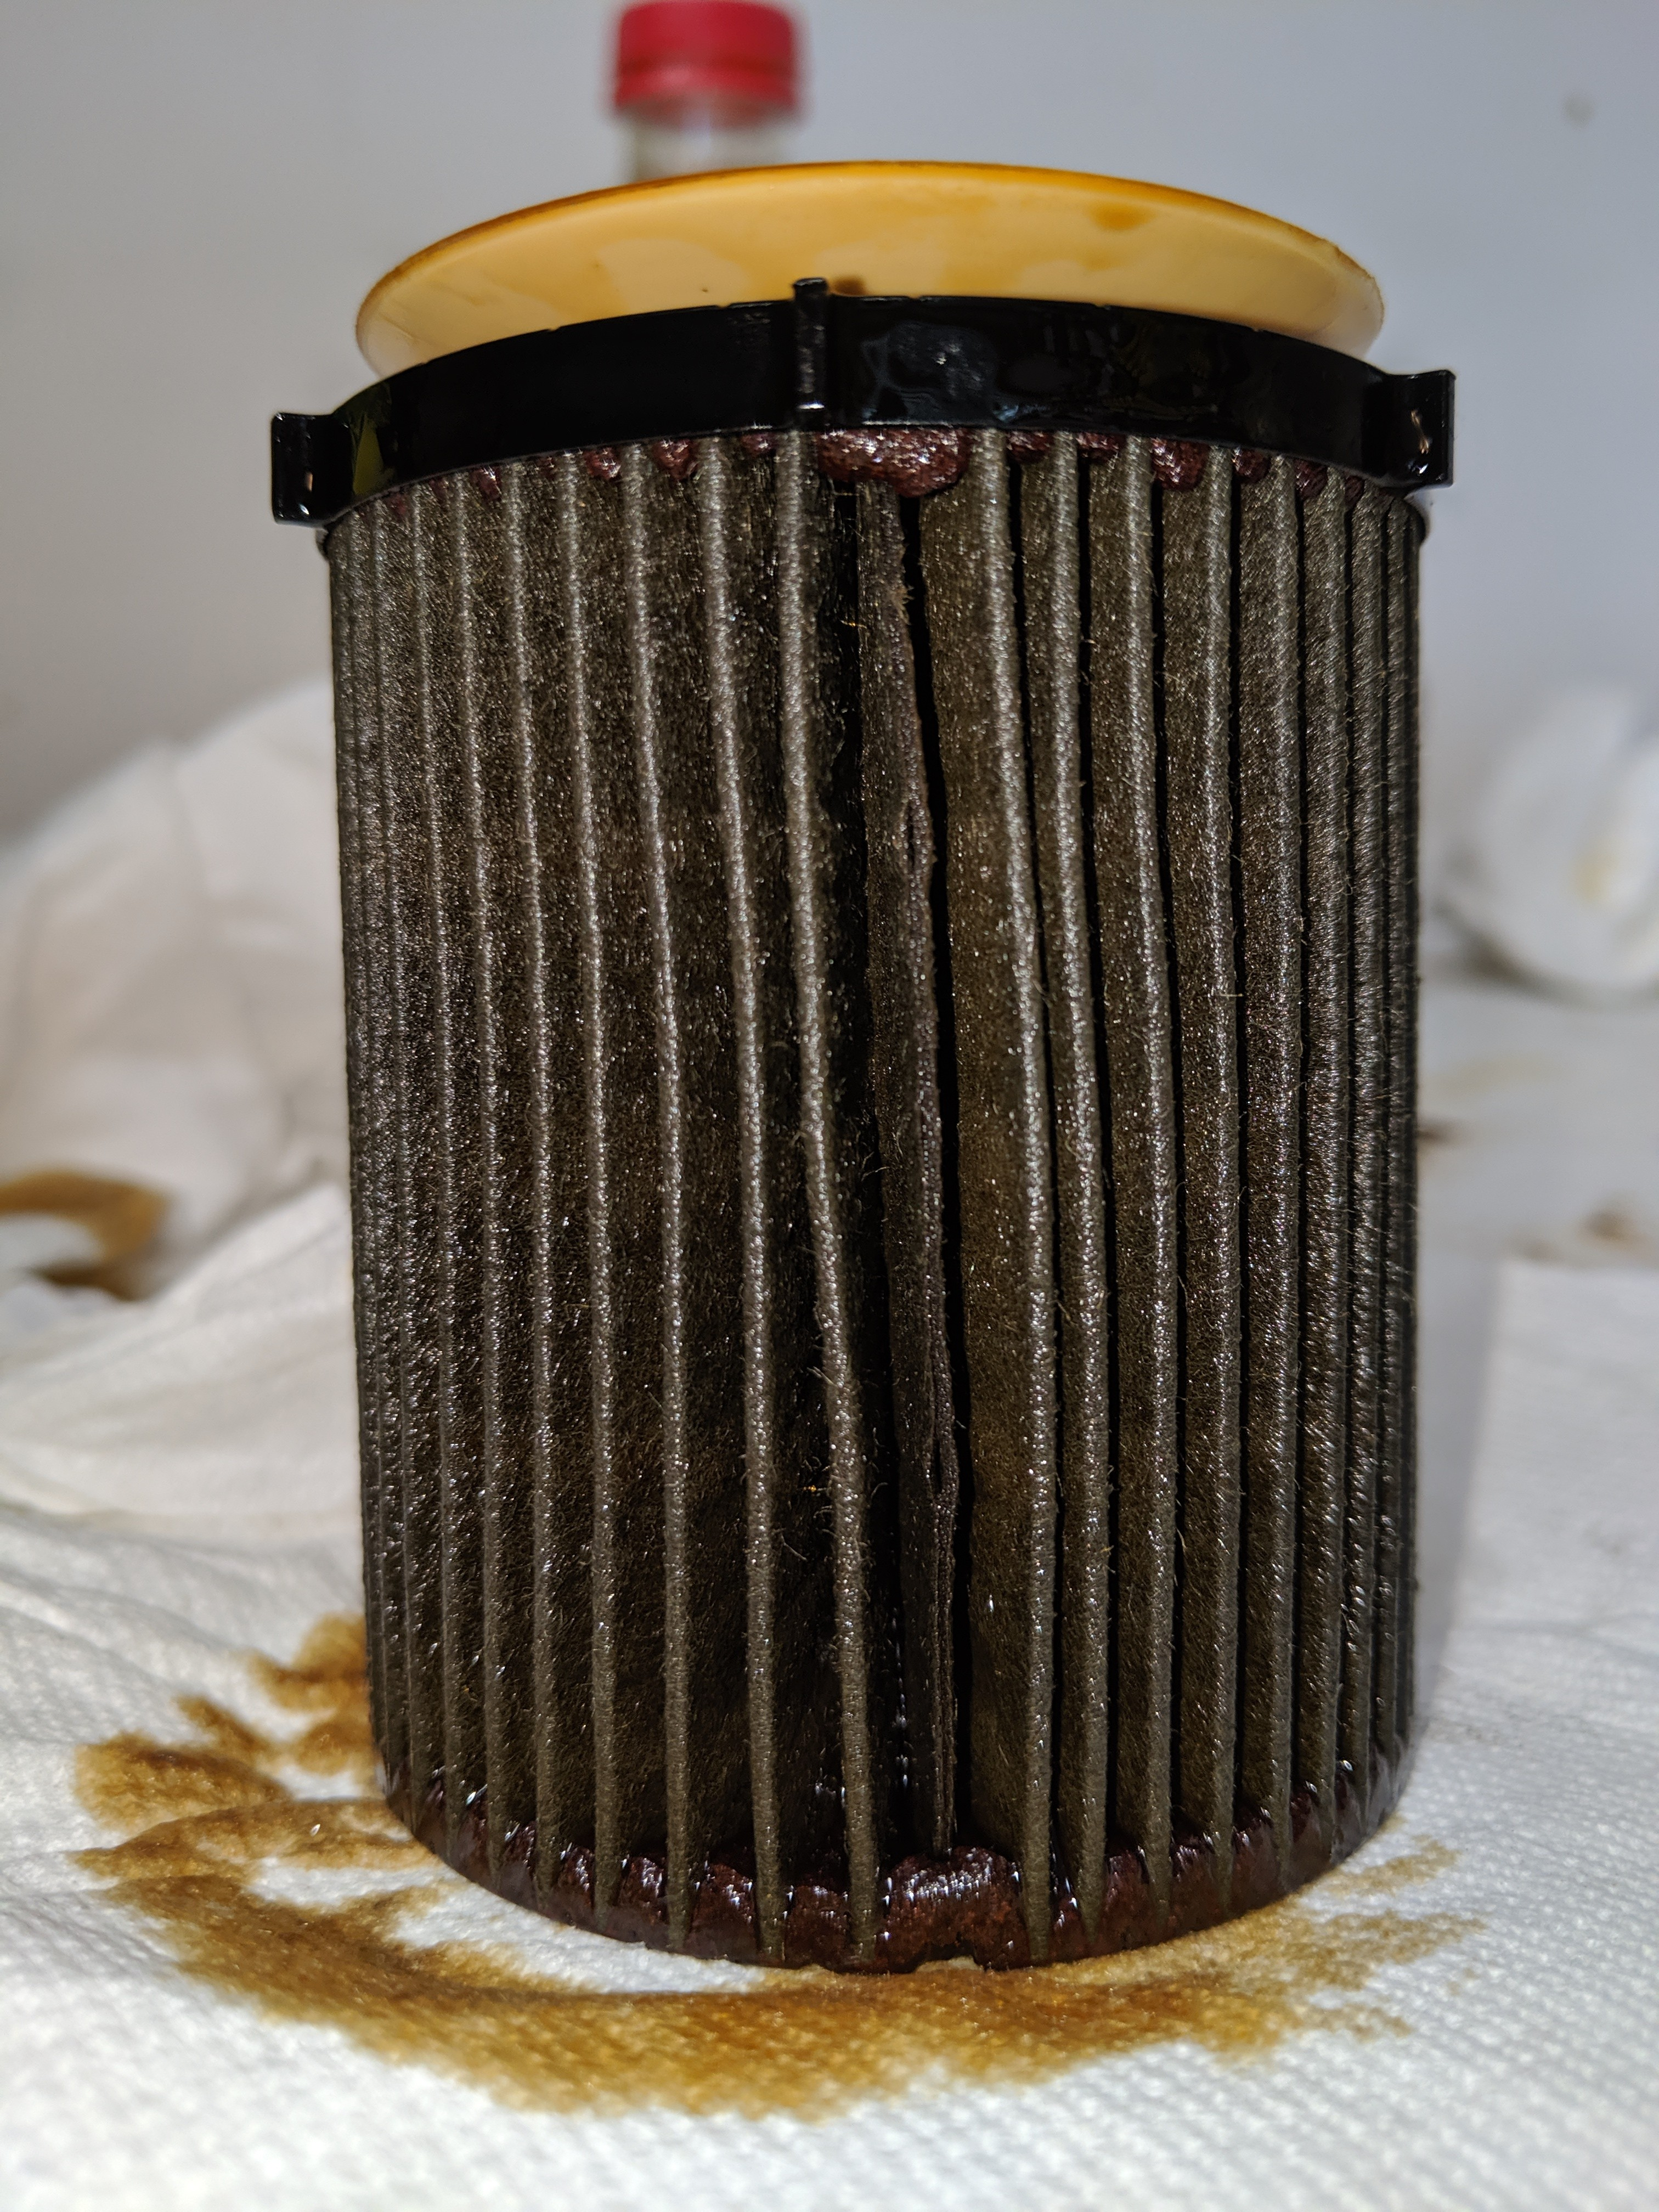 Mann HU711/6 Cartridge Filter [5,487 Miles] - Bob Is The Oil Guy